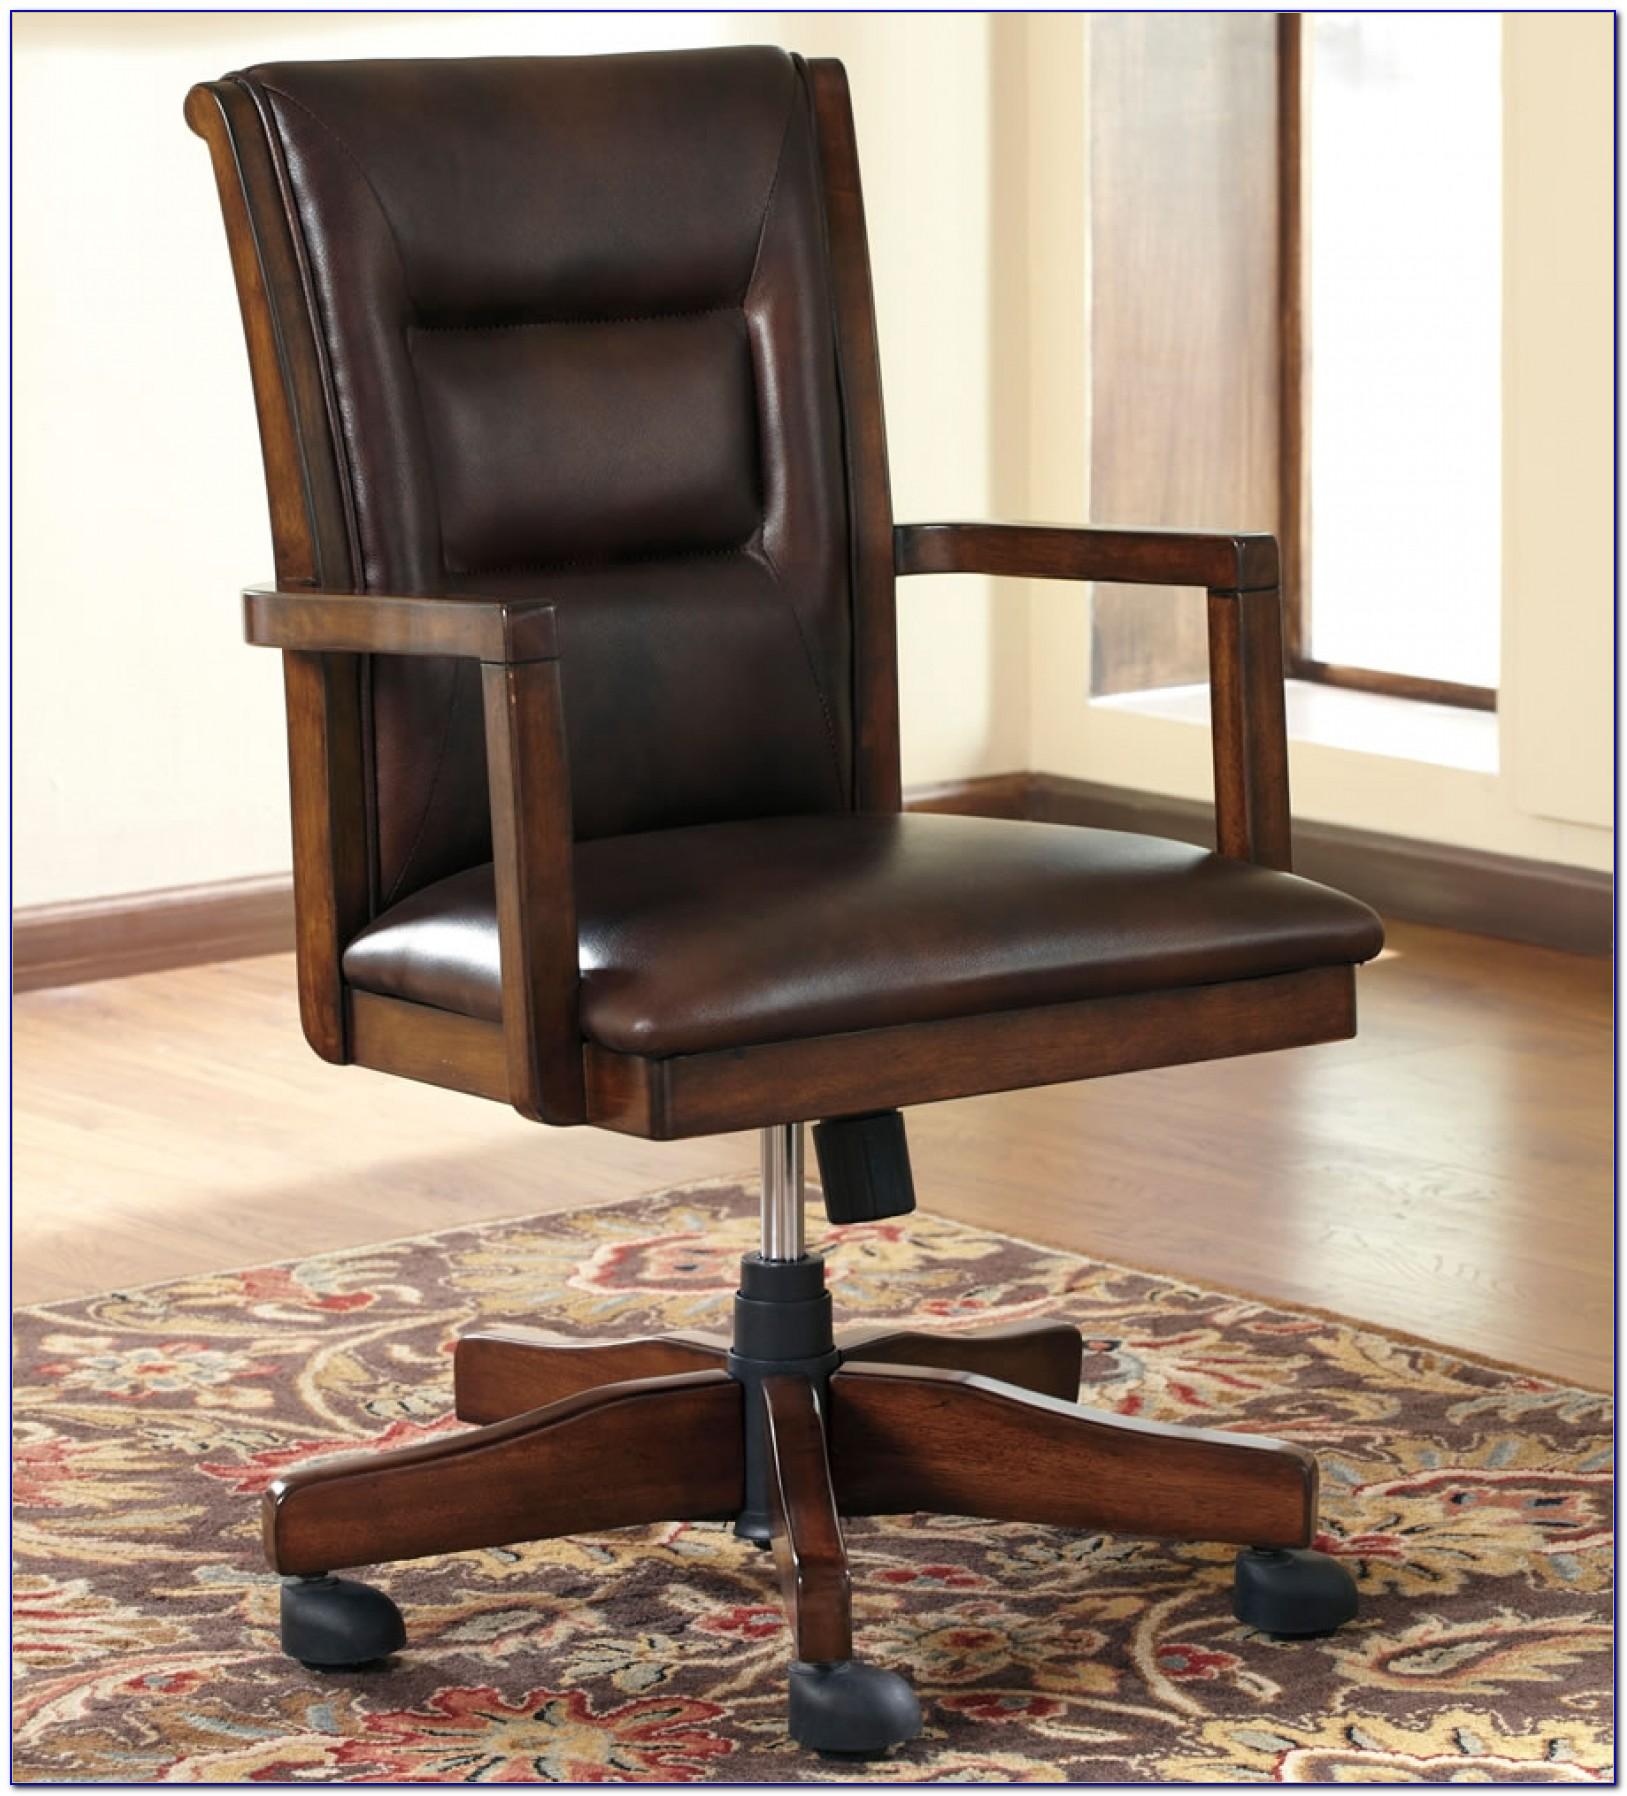 Wooden Swivel Desk Chair Australia